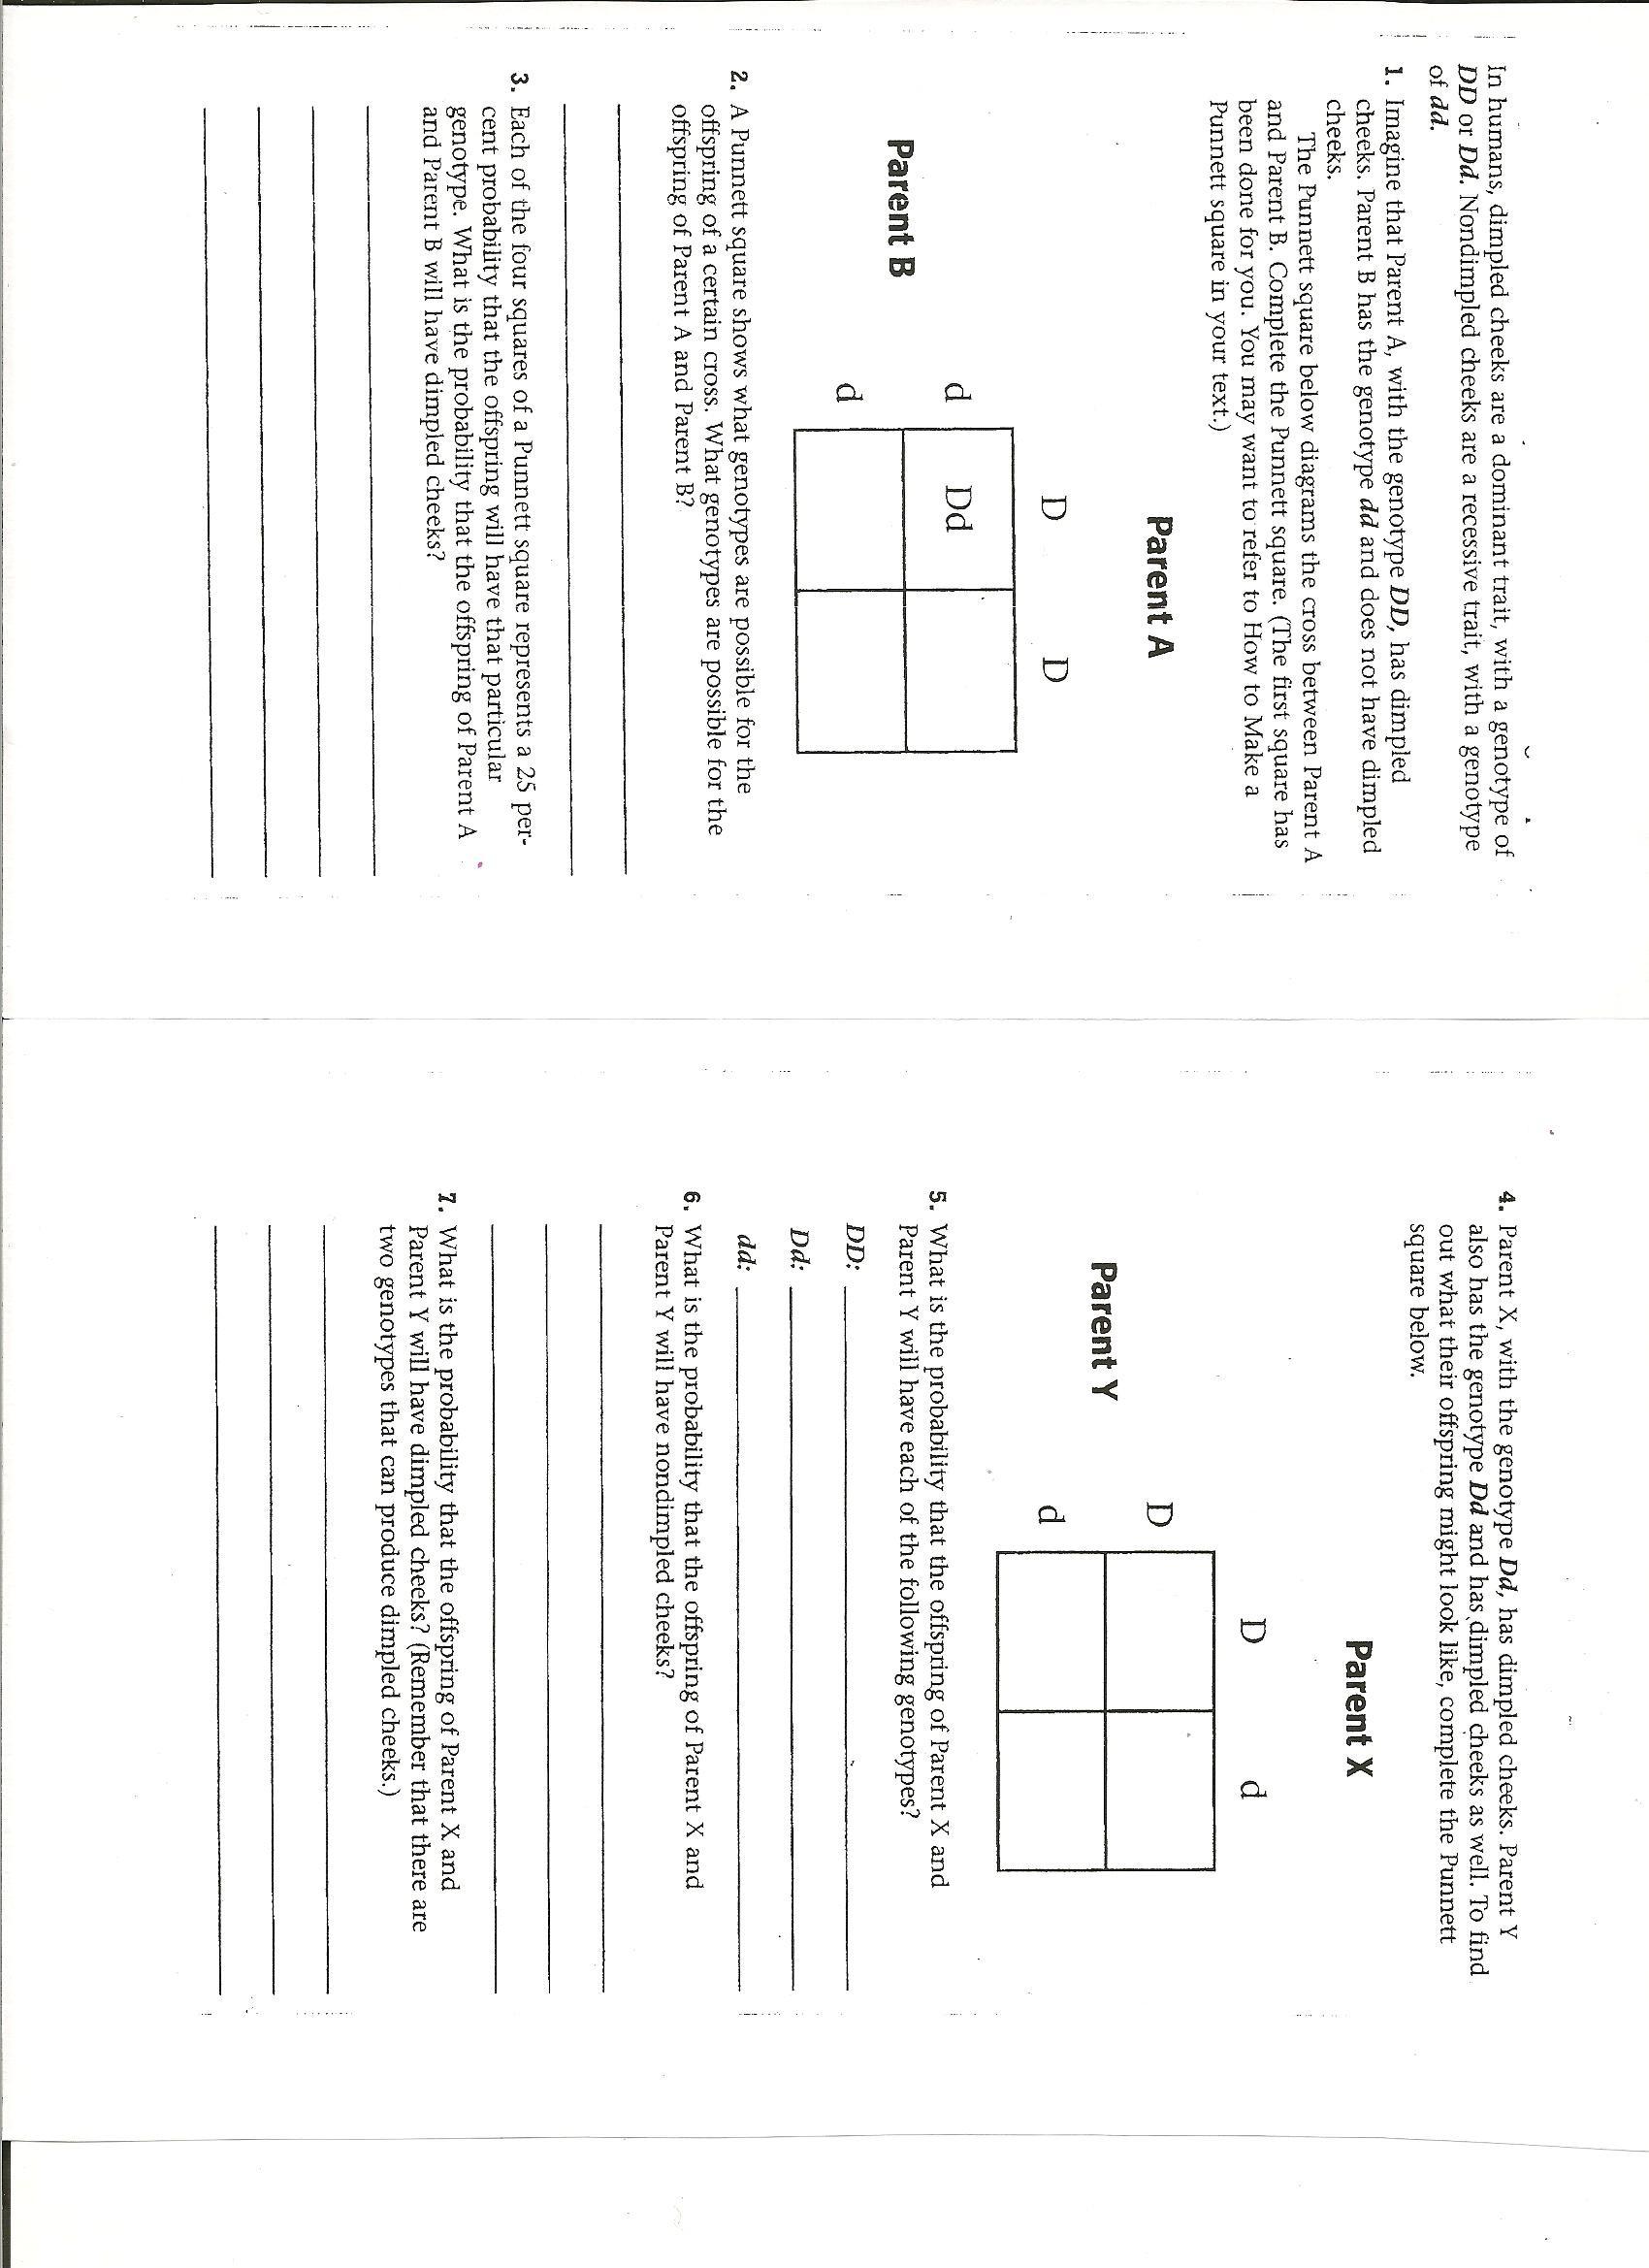 Genetics Practice Problems Worksheet Answers Worksheet Punnett Square Practice Worksheet Hunterhq Free